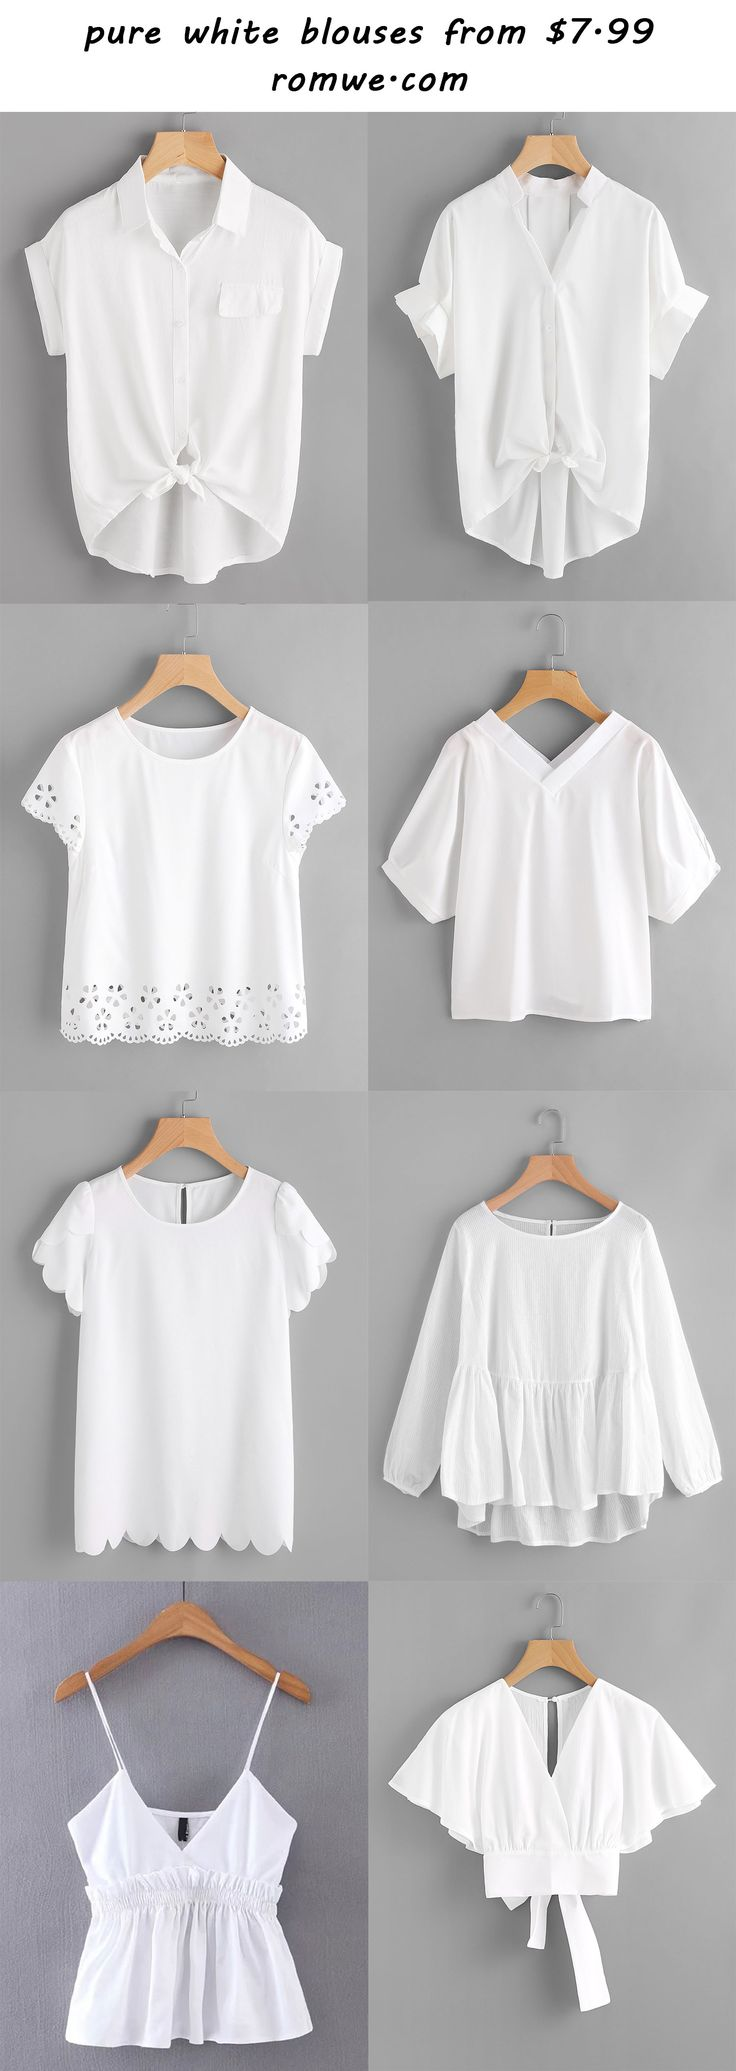 pure white blouses 2017 - romwe.com